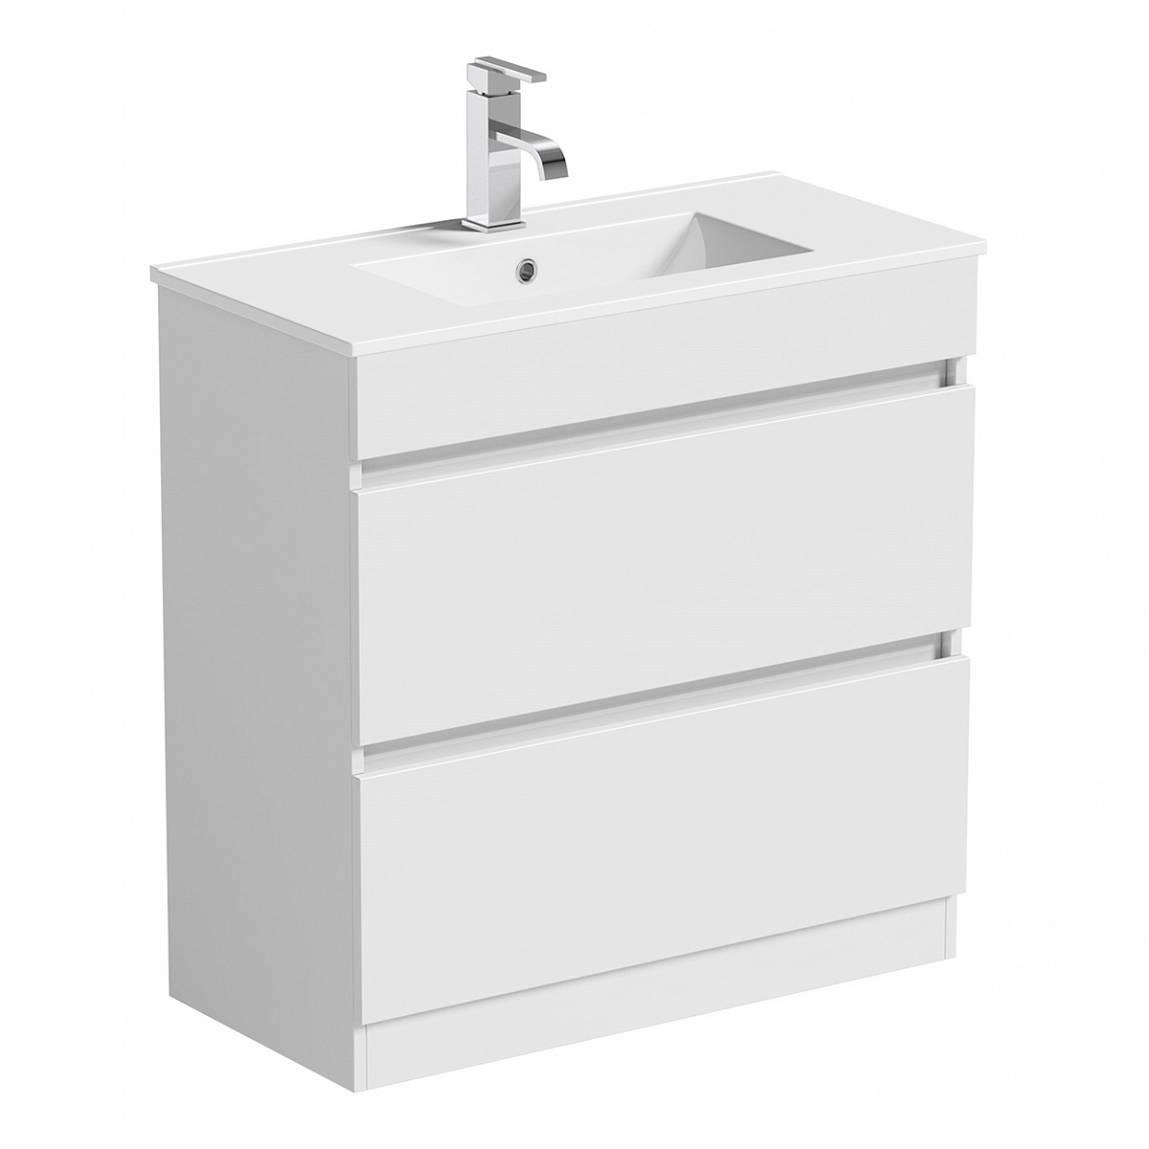 Image of Plan White Floor Mounted 800 Drawer Unit & Basin